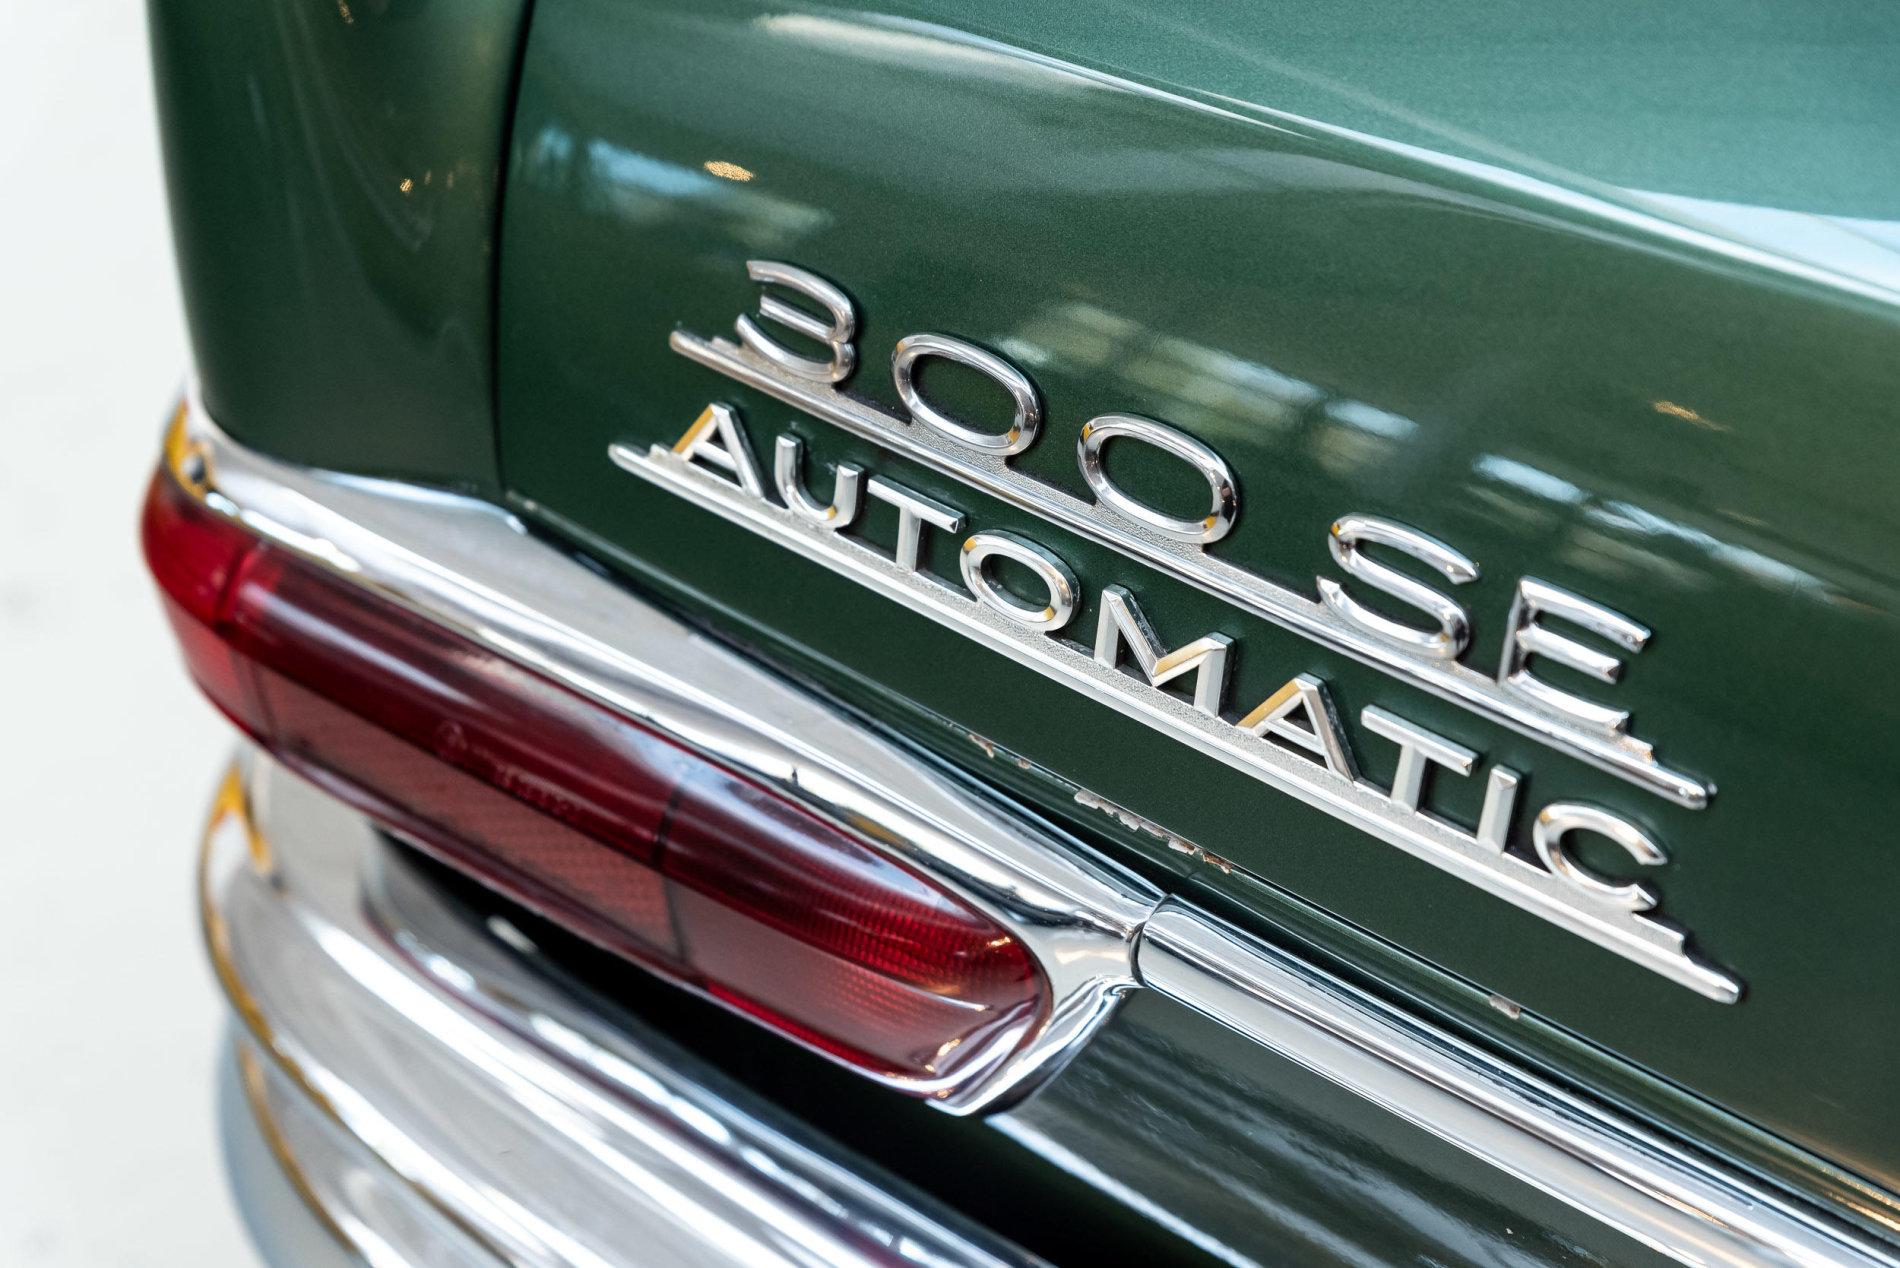 Mercedes 300 SE Convertible de vanzare - Mercedes 300 SE Convertible de vanzare